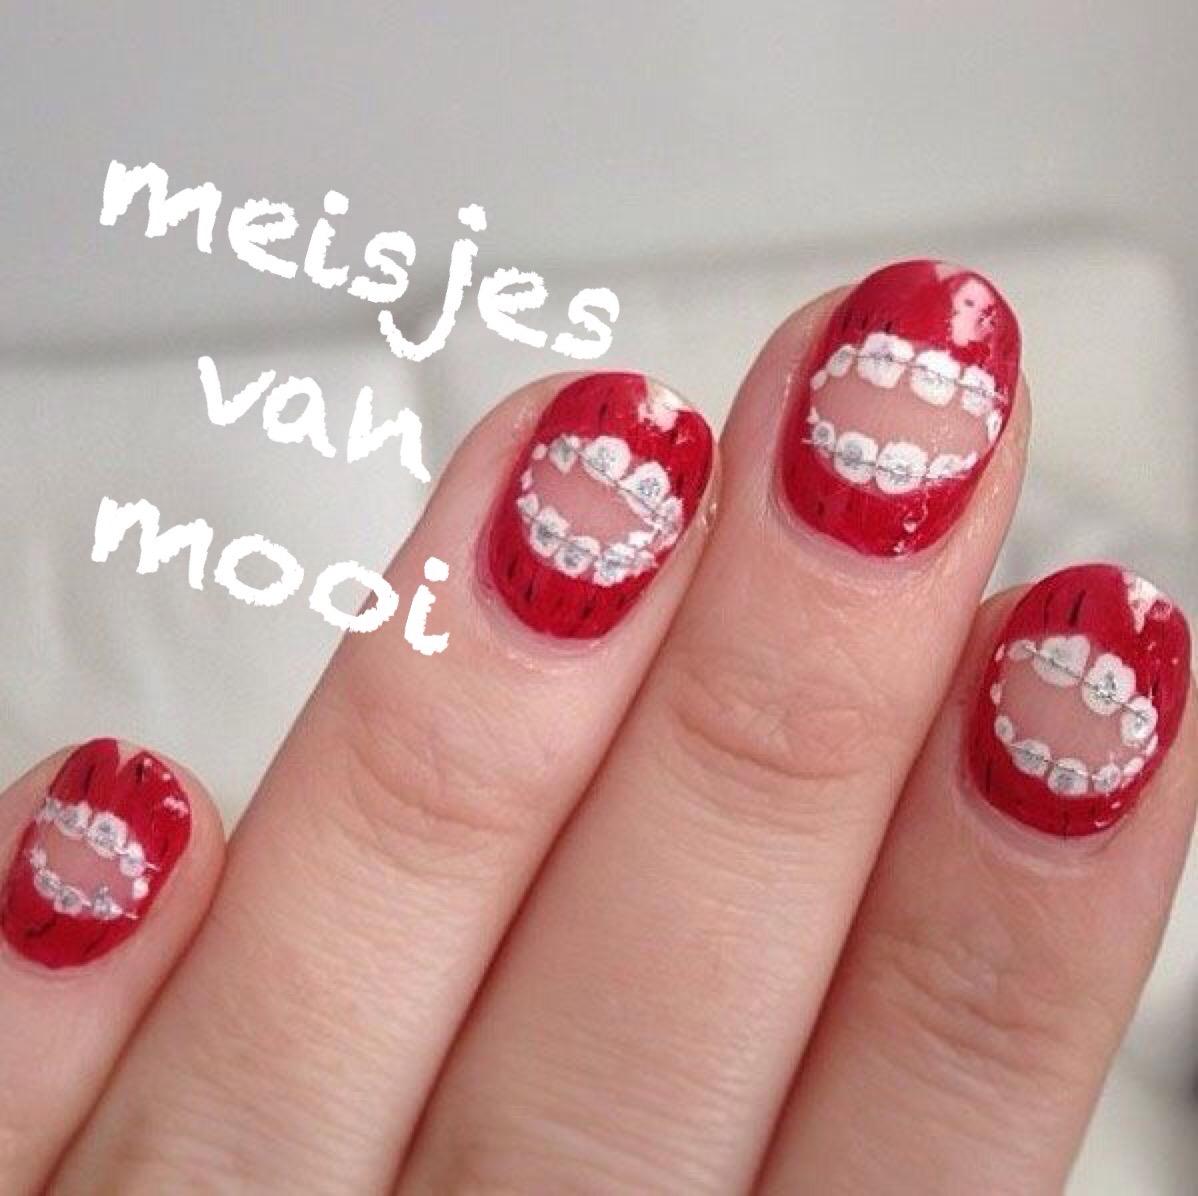 opbouw van de nagel | www.meisjesvanmooi.nl